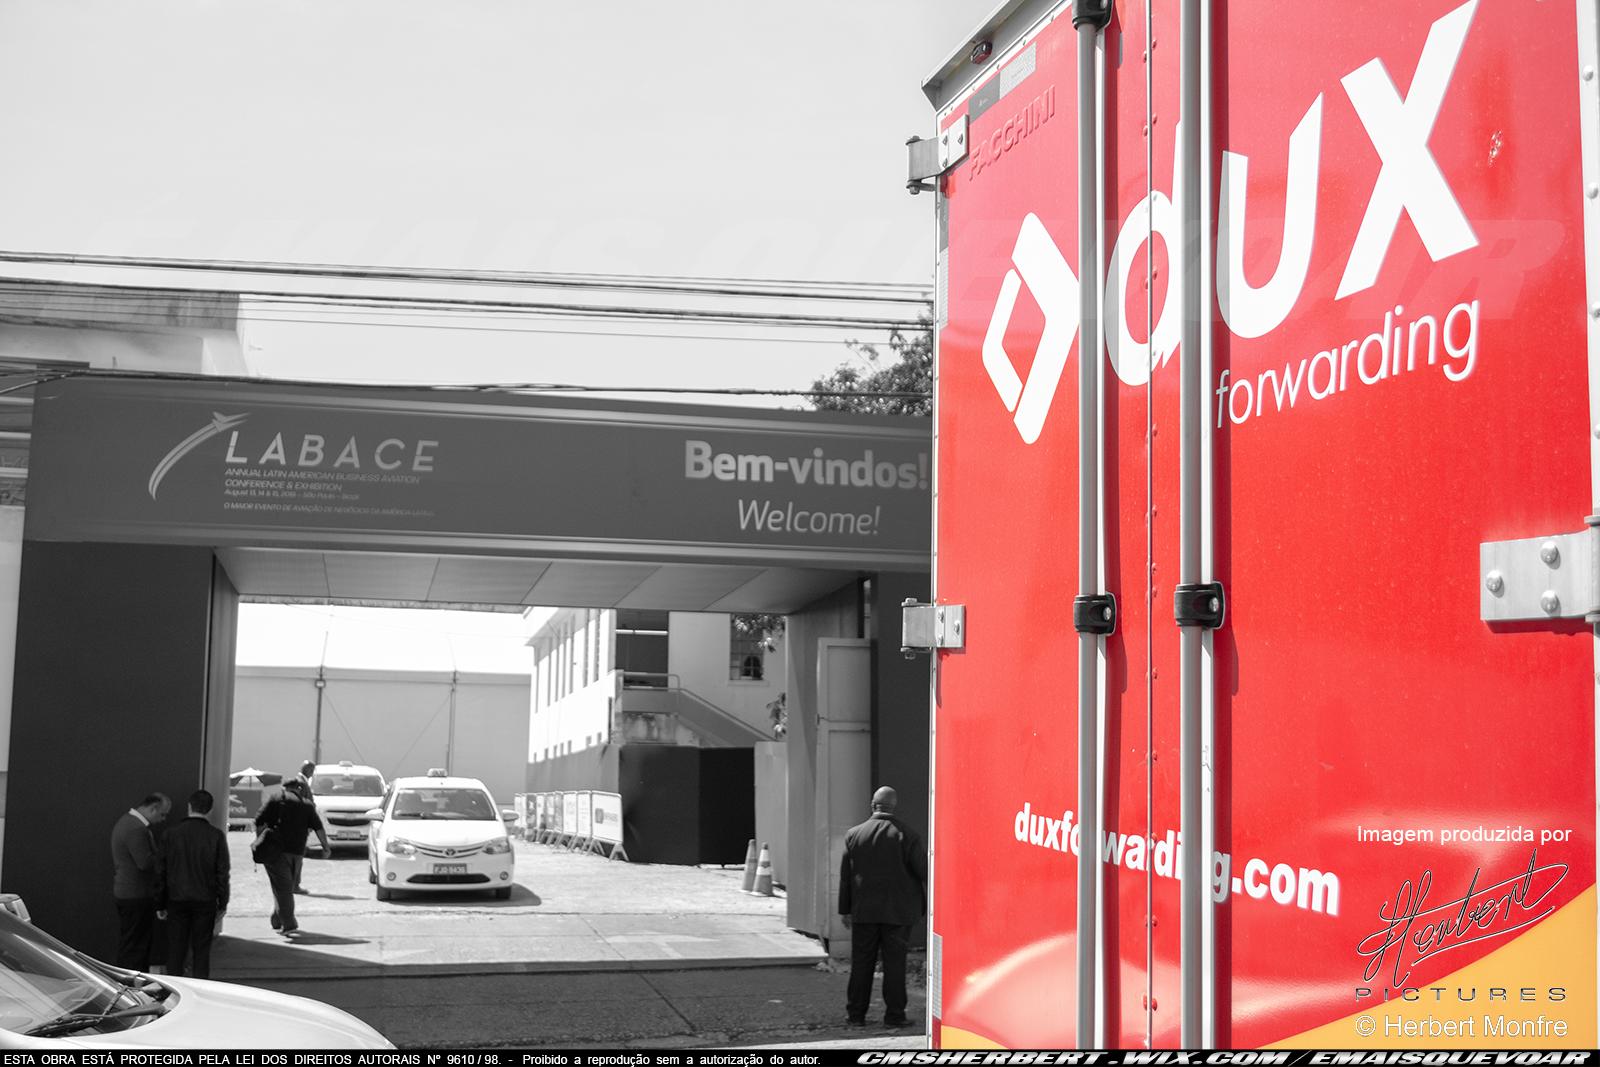 Dux Forwarding na LABACE 2019 | Foto © Herbert Monfre - Contrate o fotógrafo em cmsherbert@hotmail.com | by É MAIS QUE VOAR